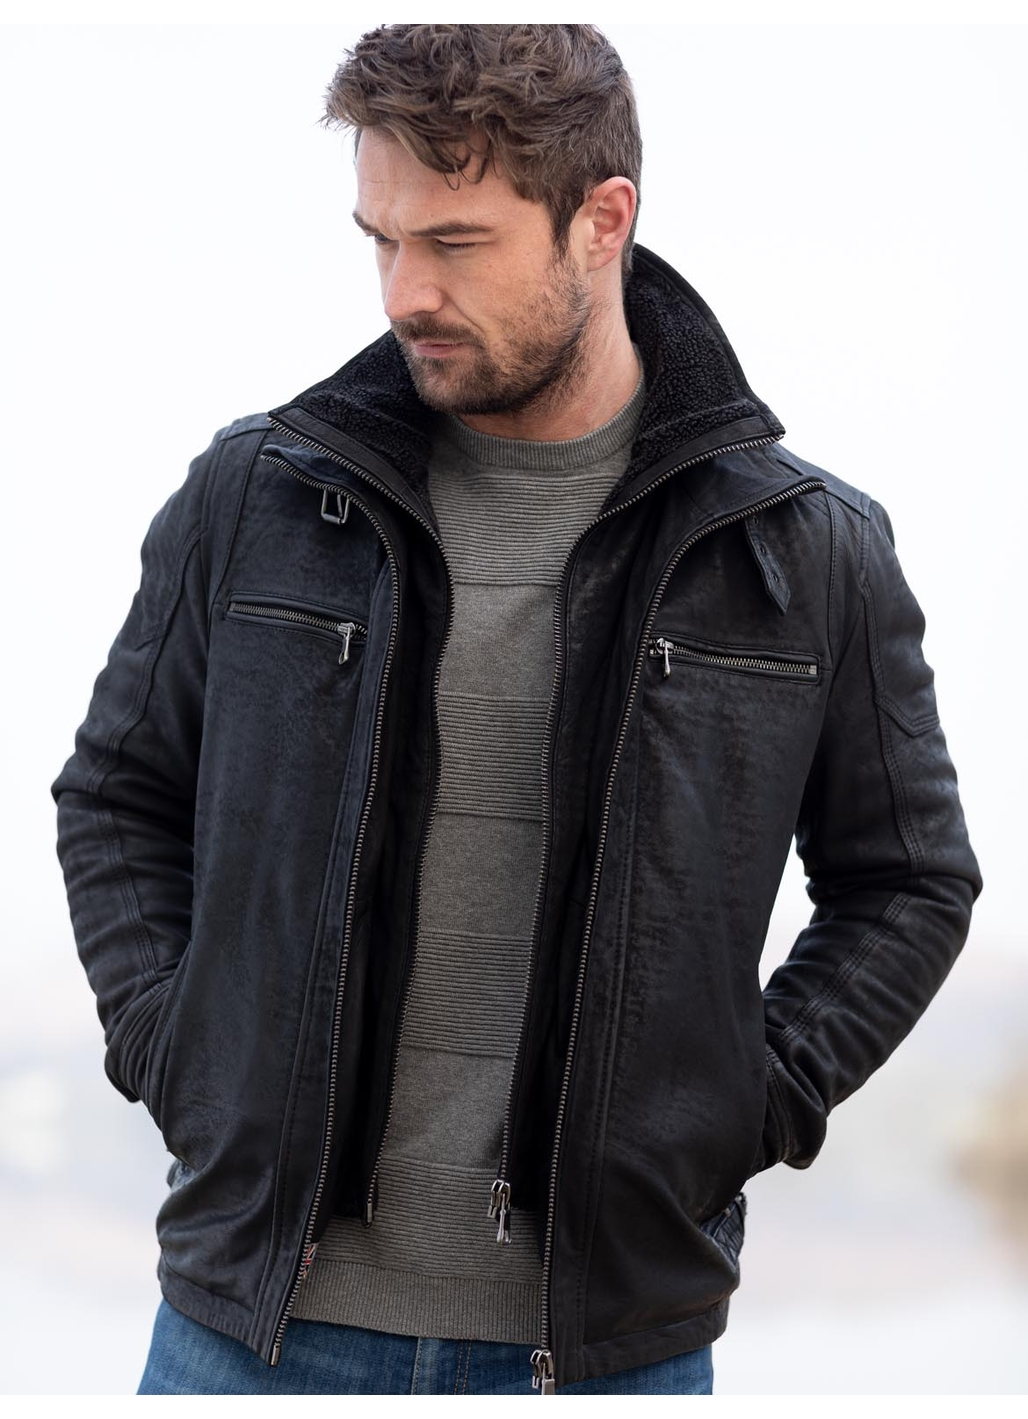 Derwent Leather Coat in Black